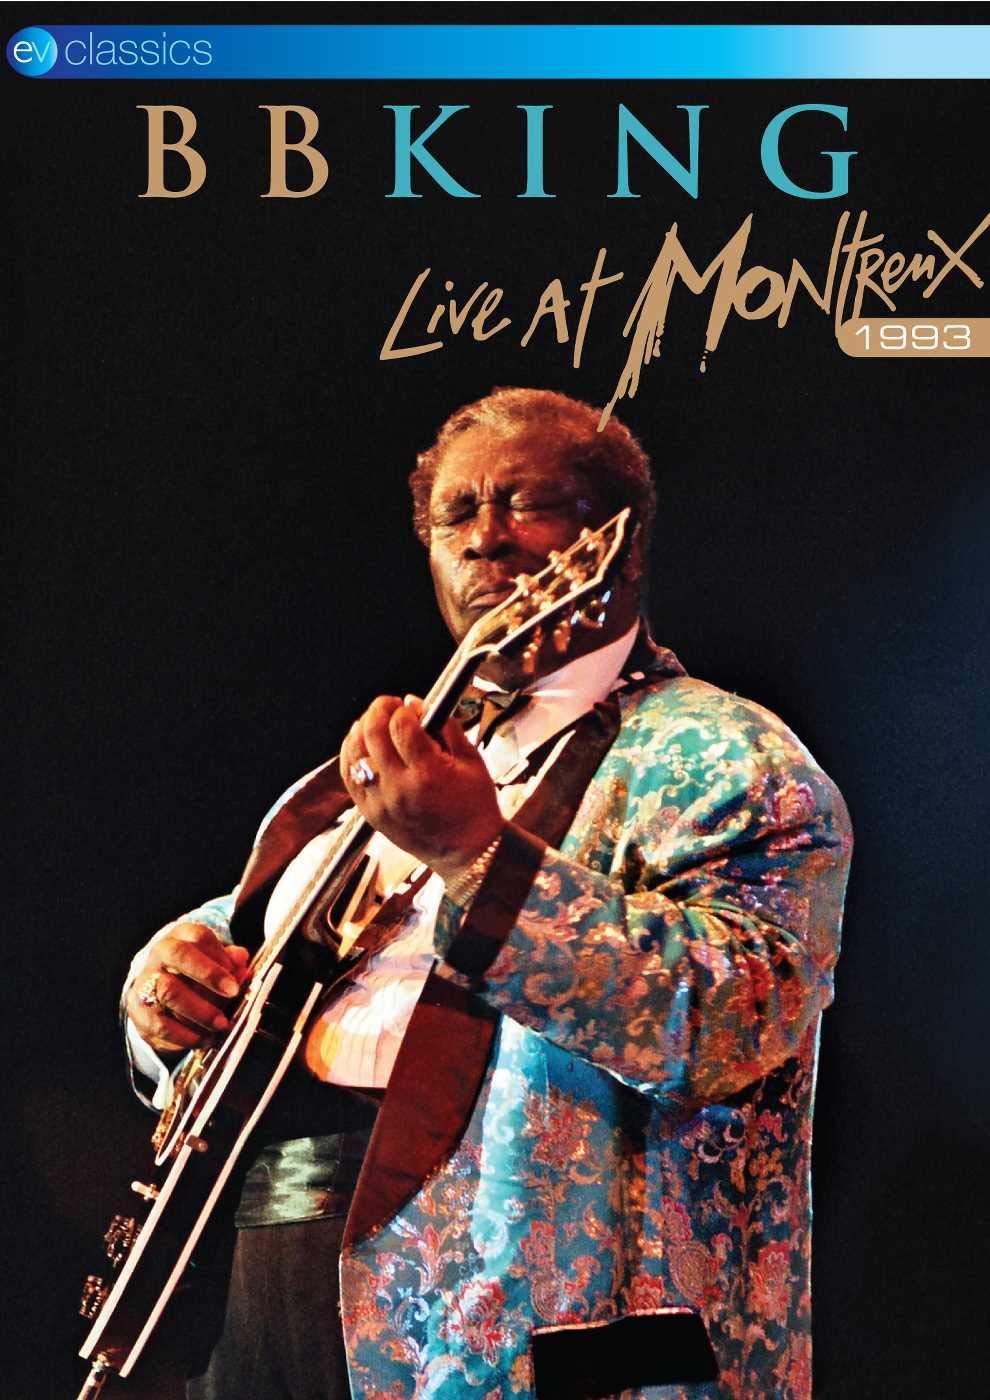 Live At Montreux 1993 [DVD]: Amazon.es: B.B. King, B.B. King: Cine y Series TV